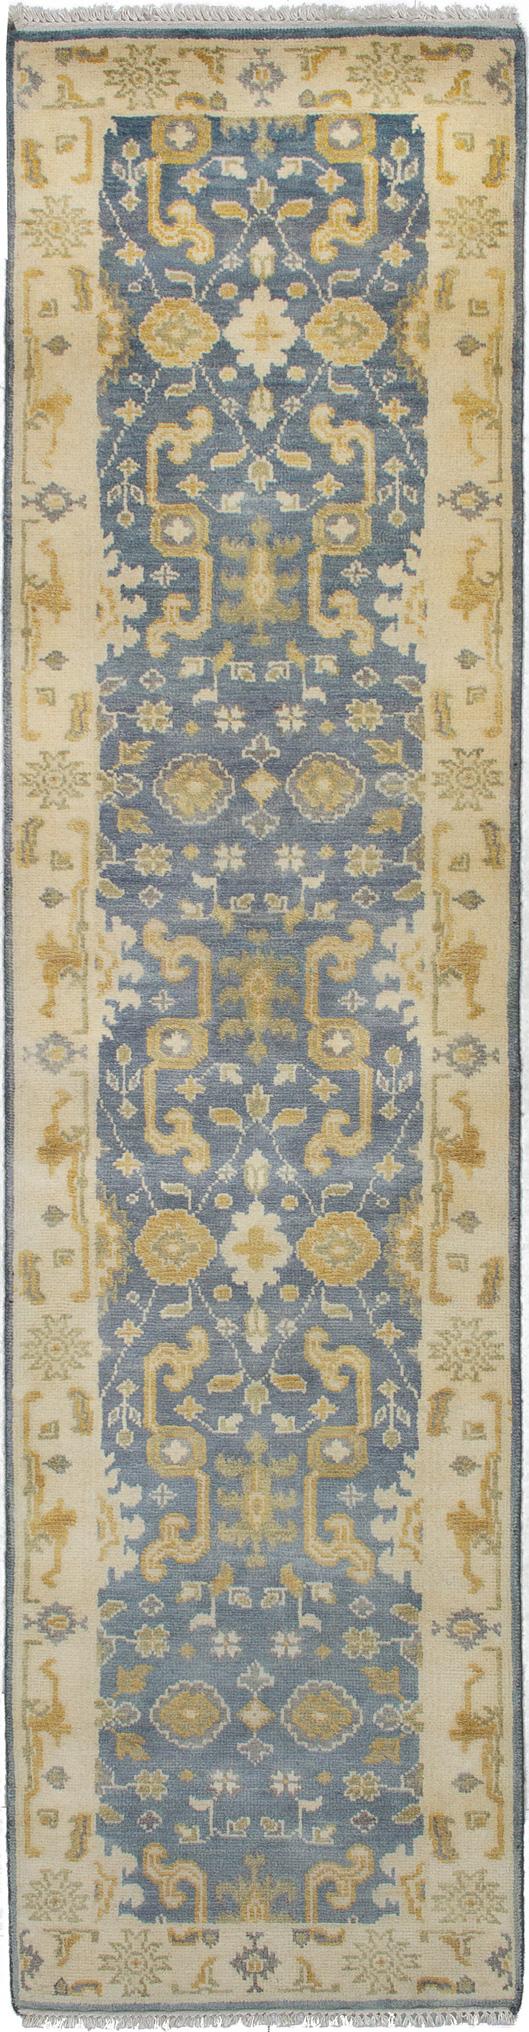 "Hand-knotted Royal Ushak Light Denim Blue Wool Rug 2'6"" x 9'11"" Size: 2'6"" x 9'11"""